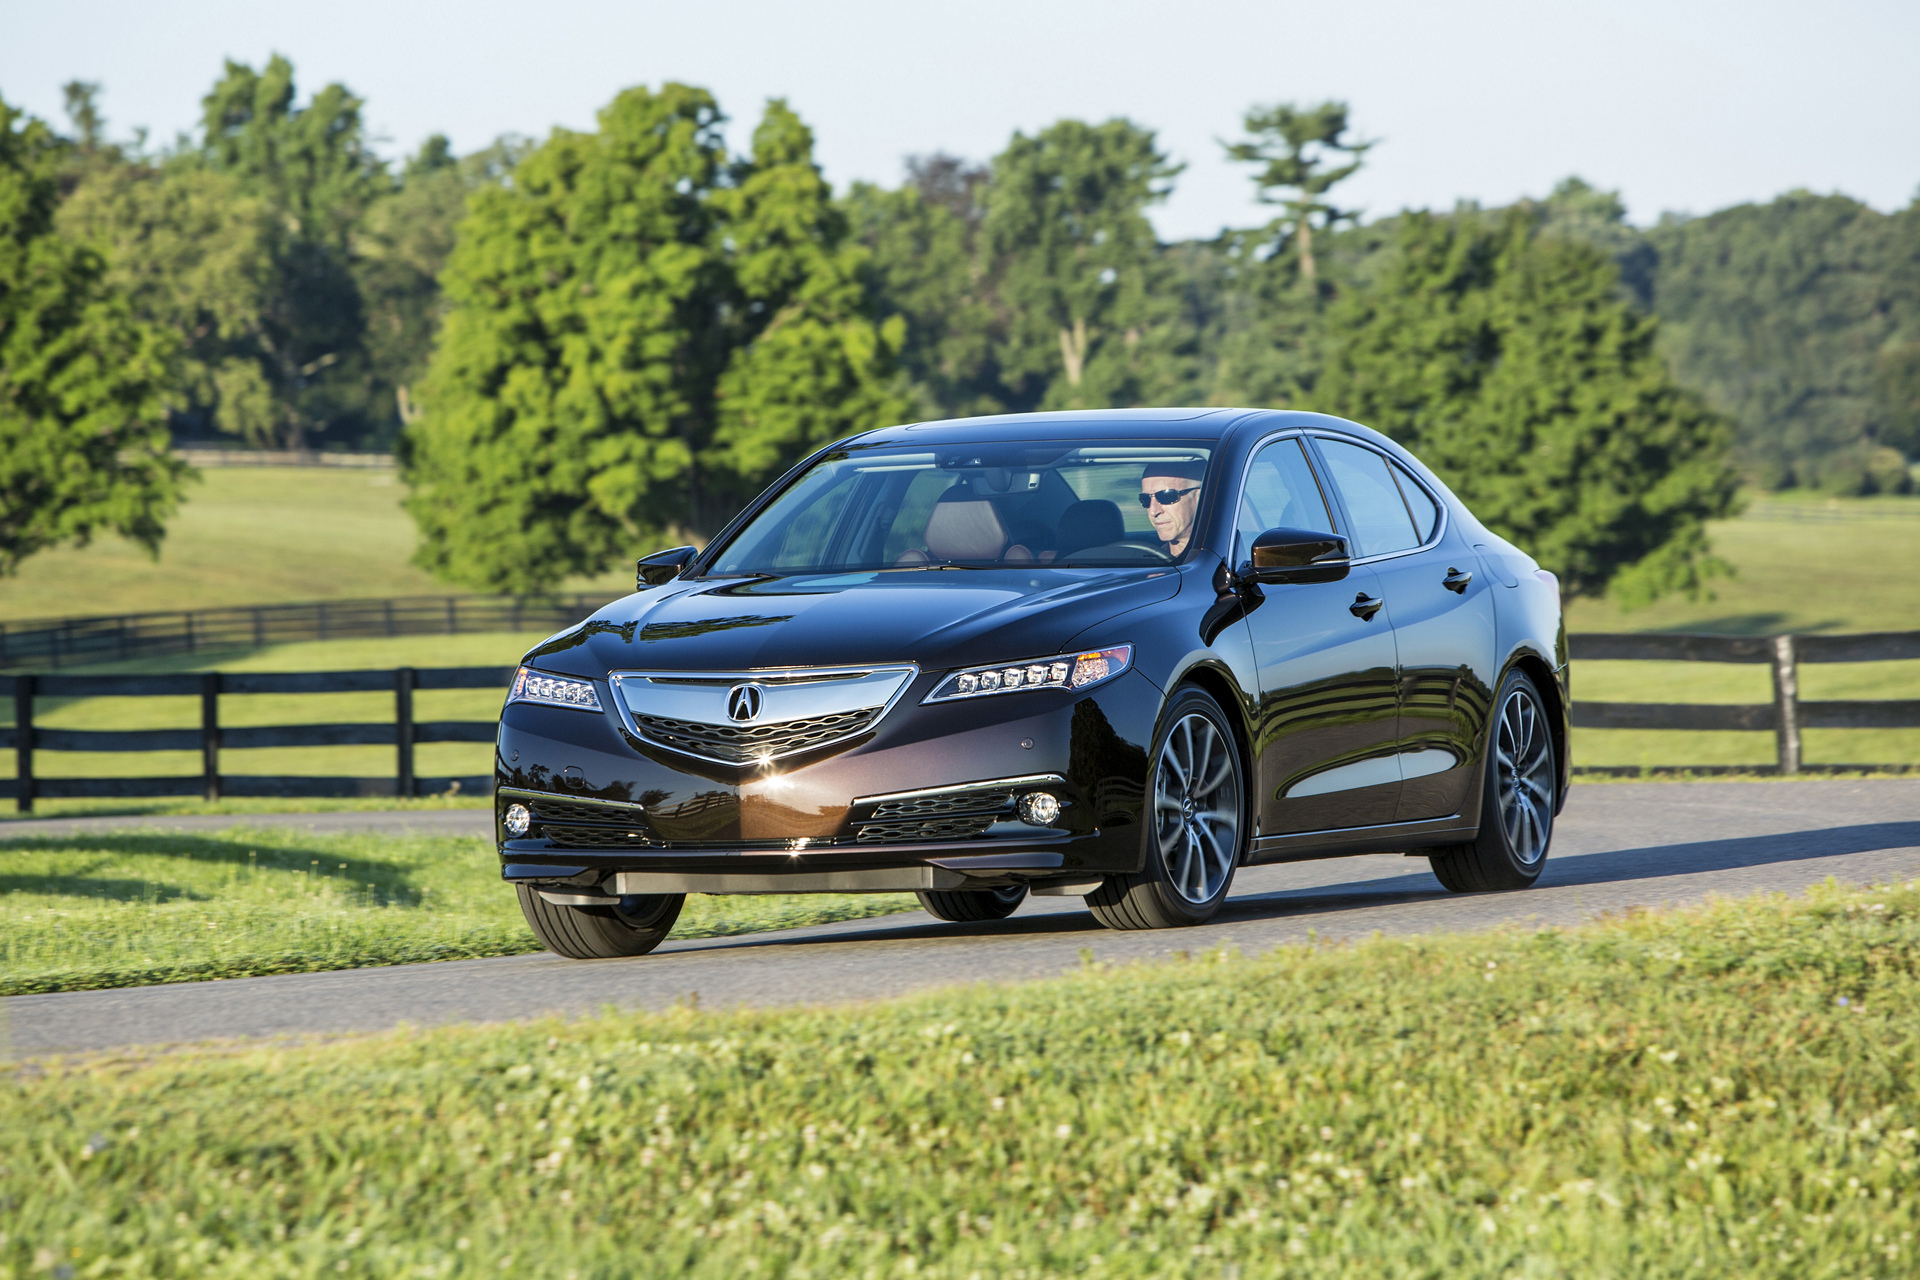 2017 Acura TLX © Honda Motor Co., Ltd.